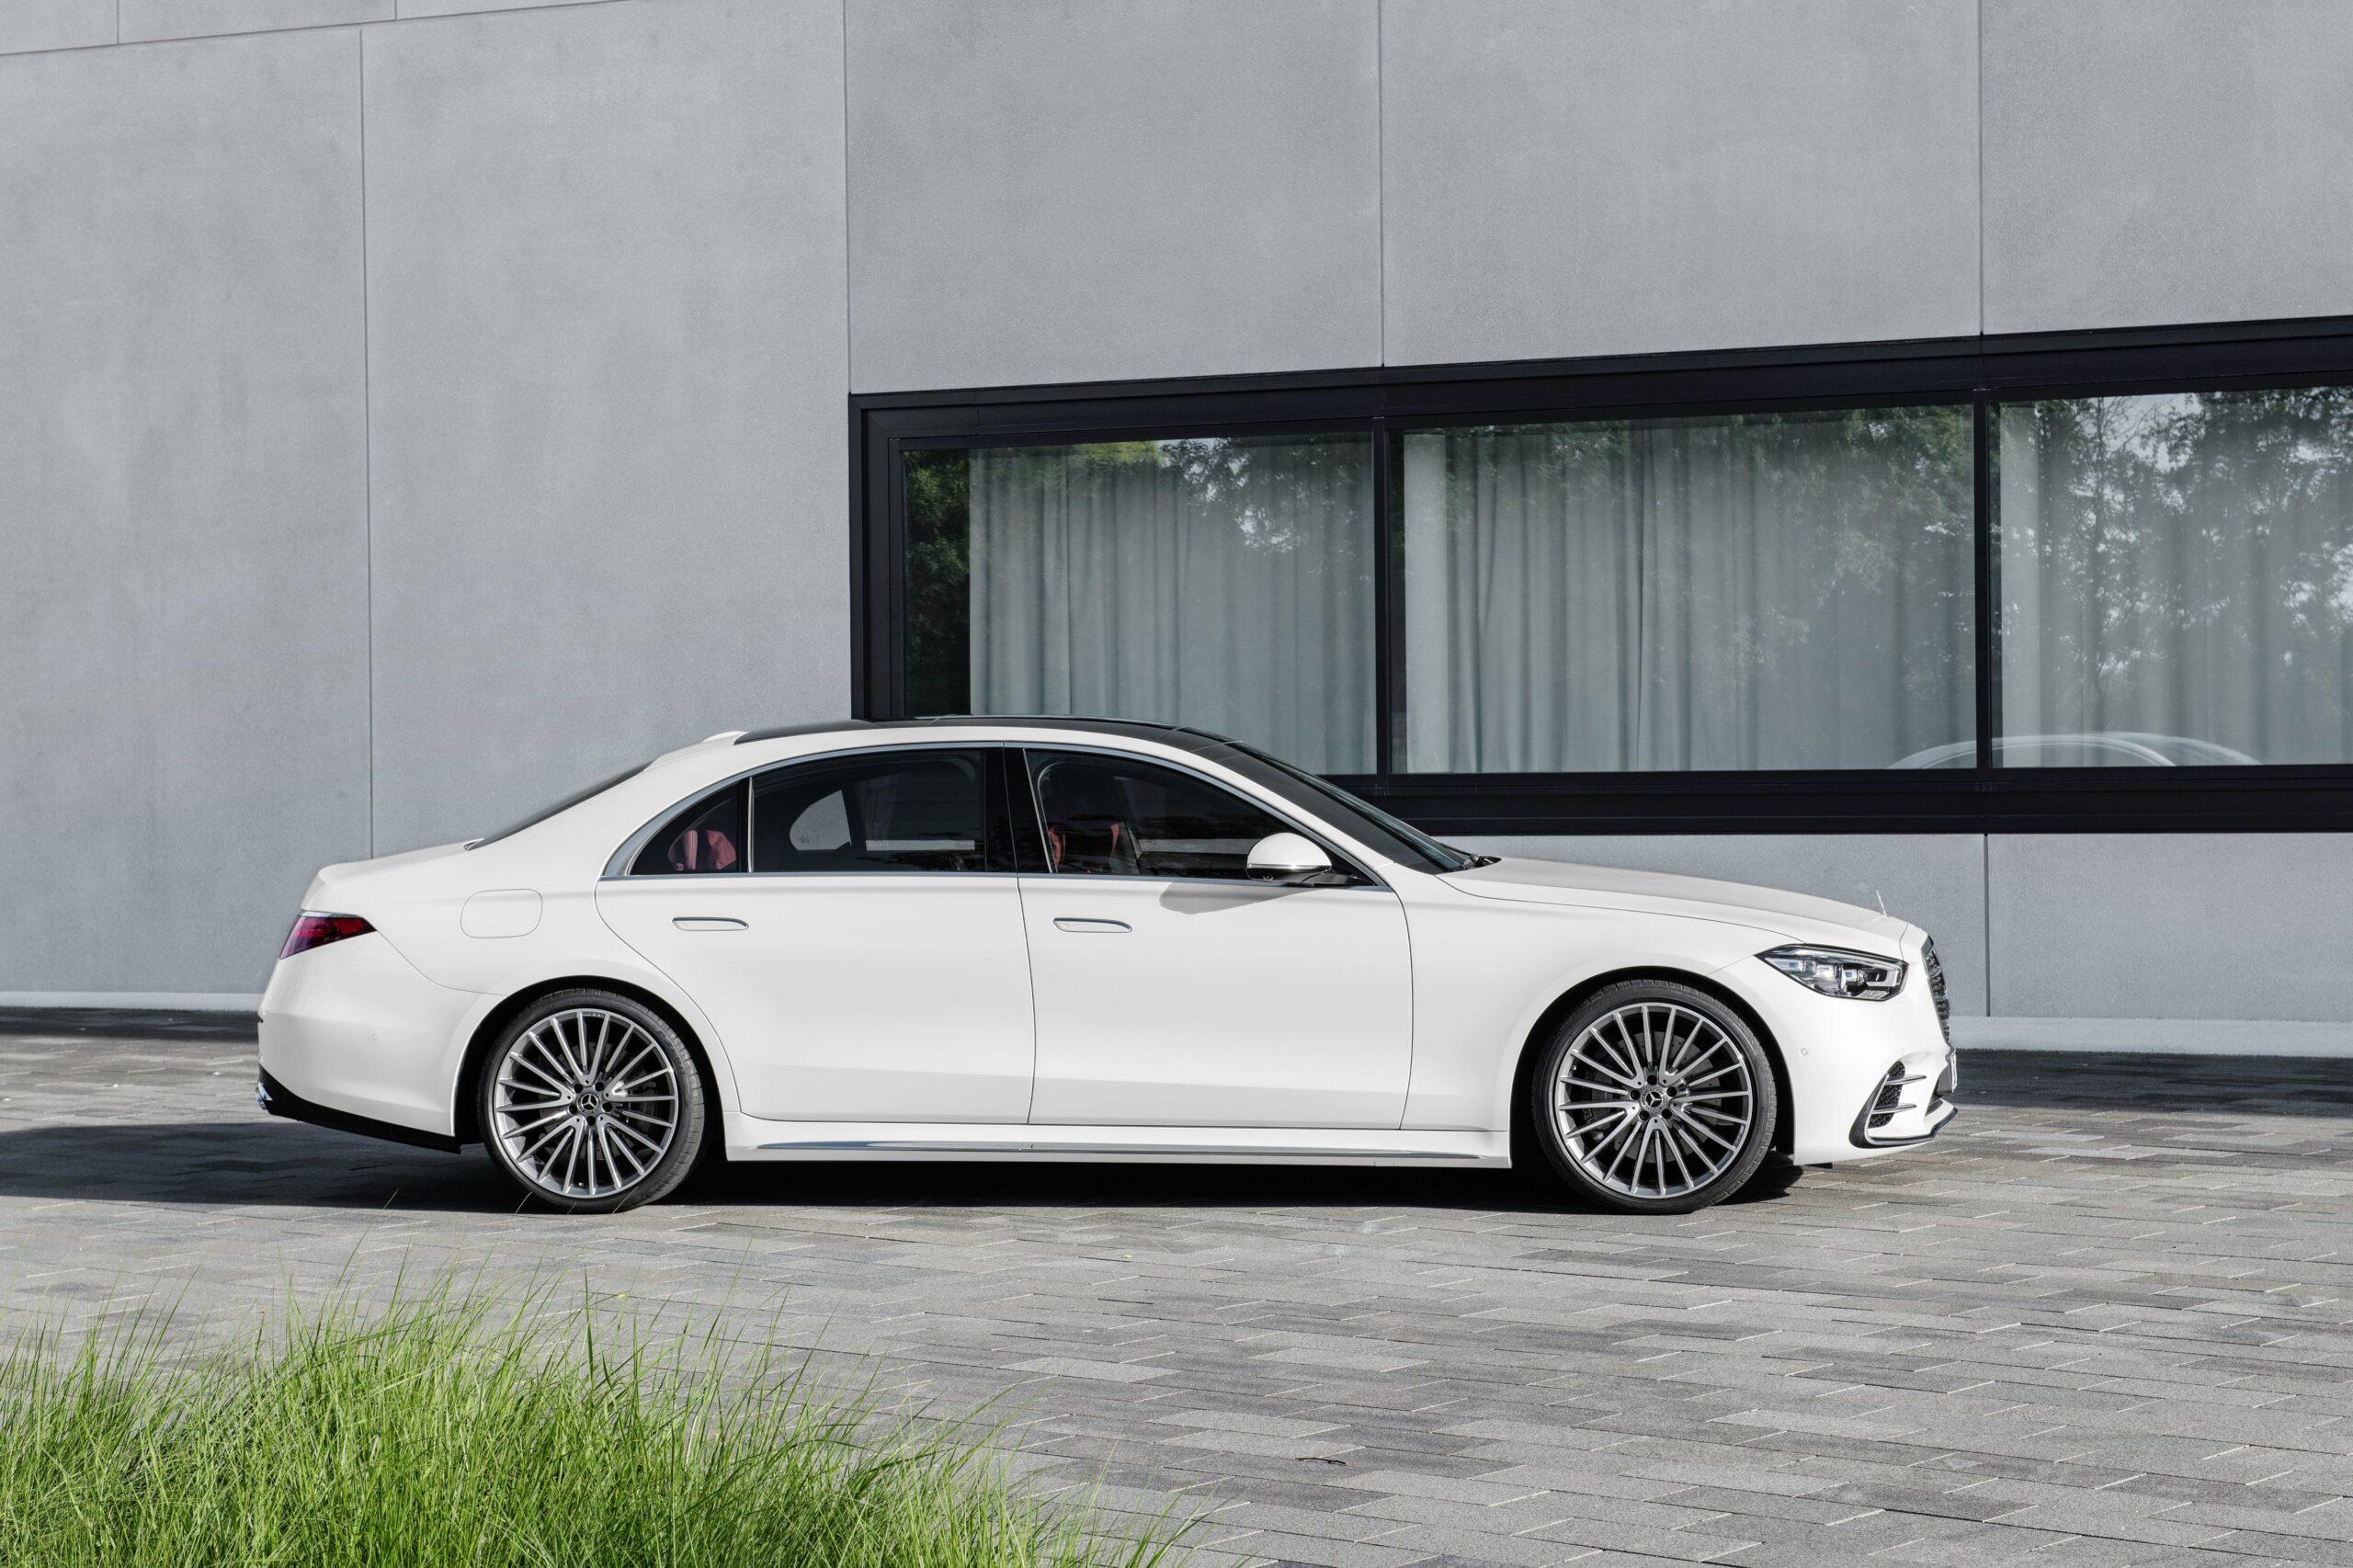 Mercedes Classe S Laterale